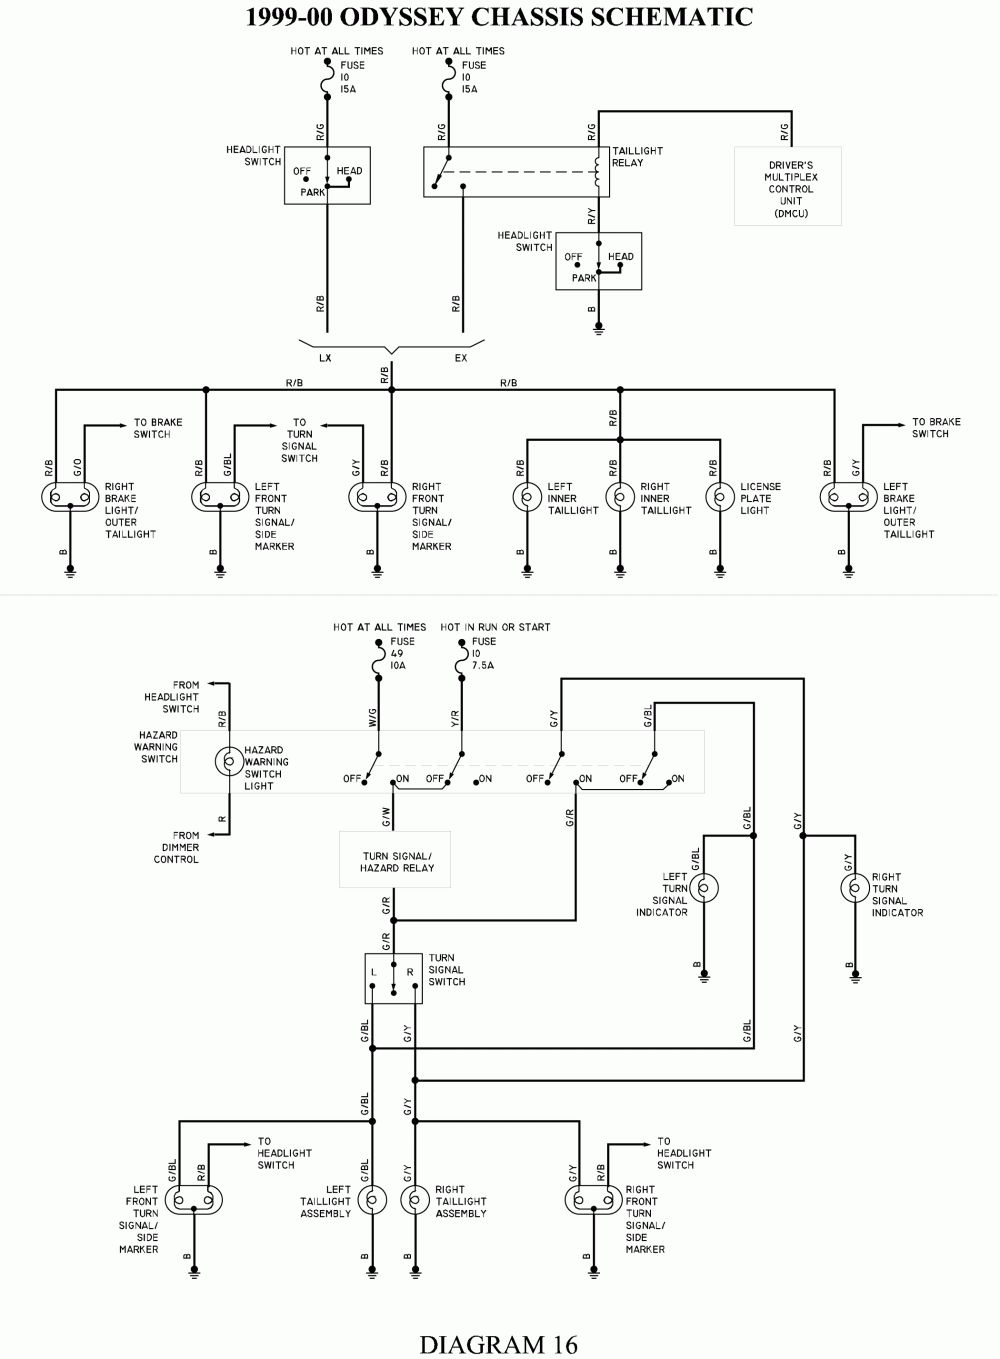 1995 Honda Civic Wiring Diagram Bmw Symbols Turn Signal 1t Schwabenschamanen De Accord Library Rh 30 Casadepaternidade Org 2006